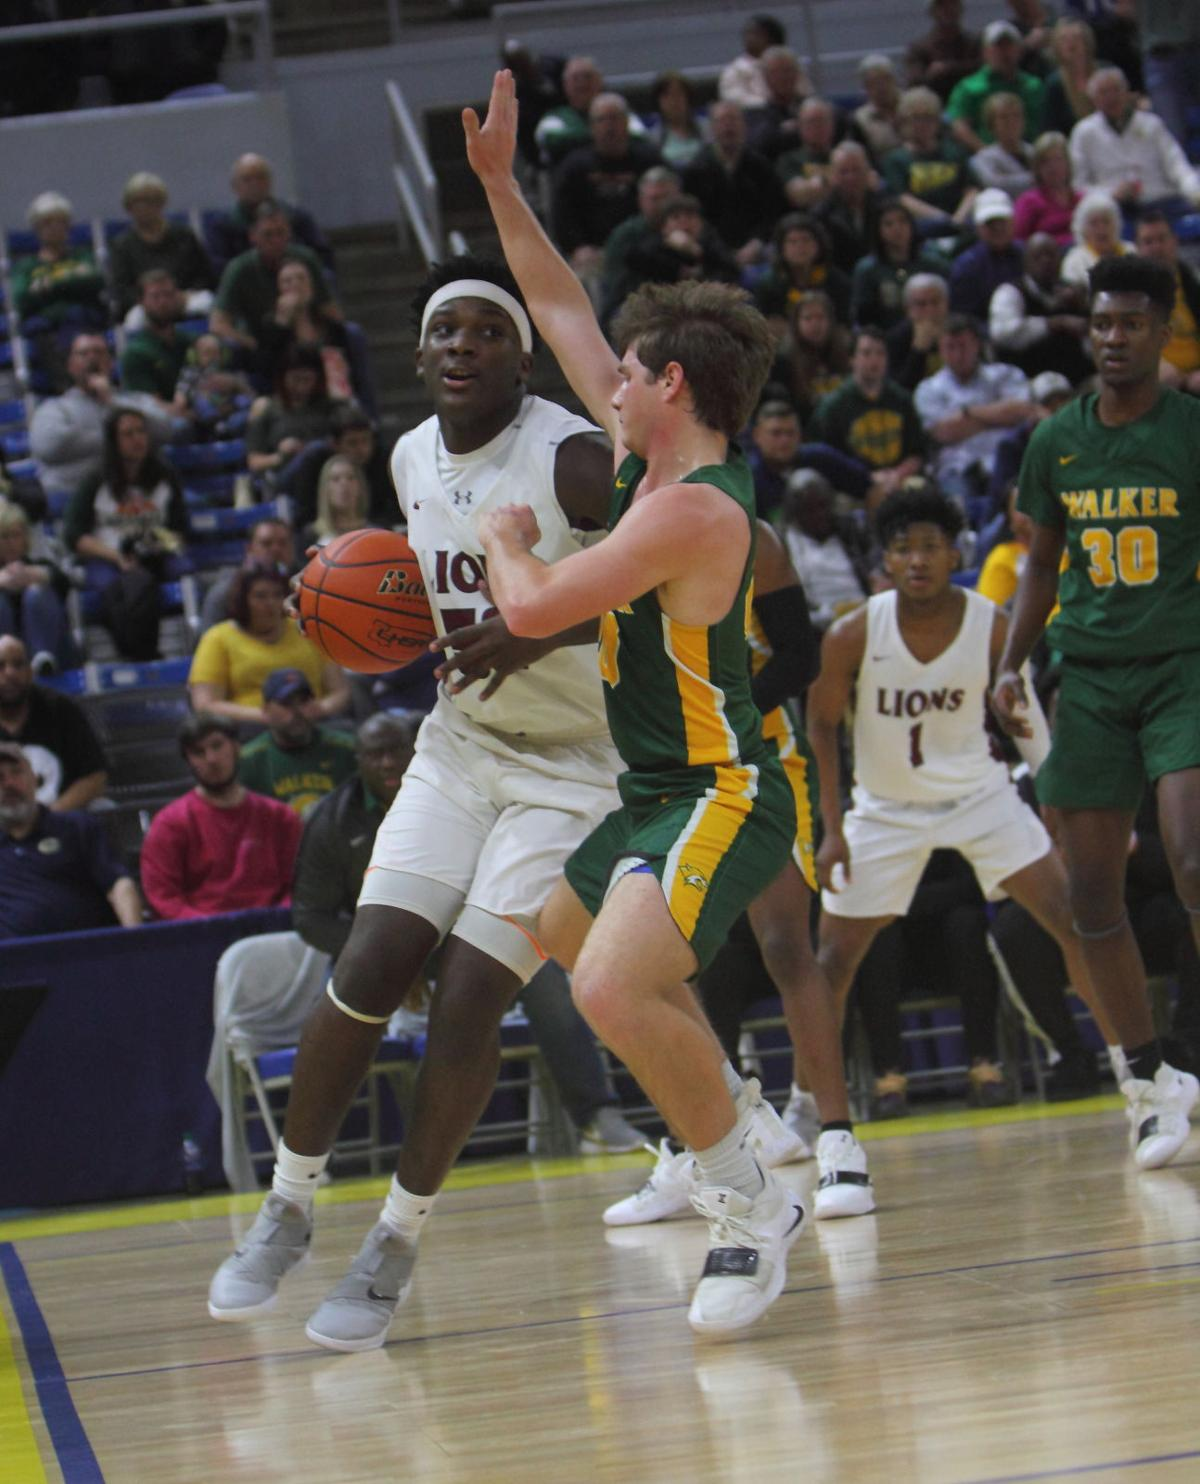 Walker vs Ouachita boys basketball Graham Smith